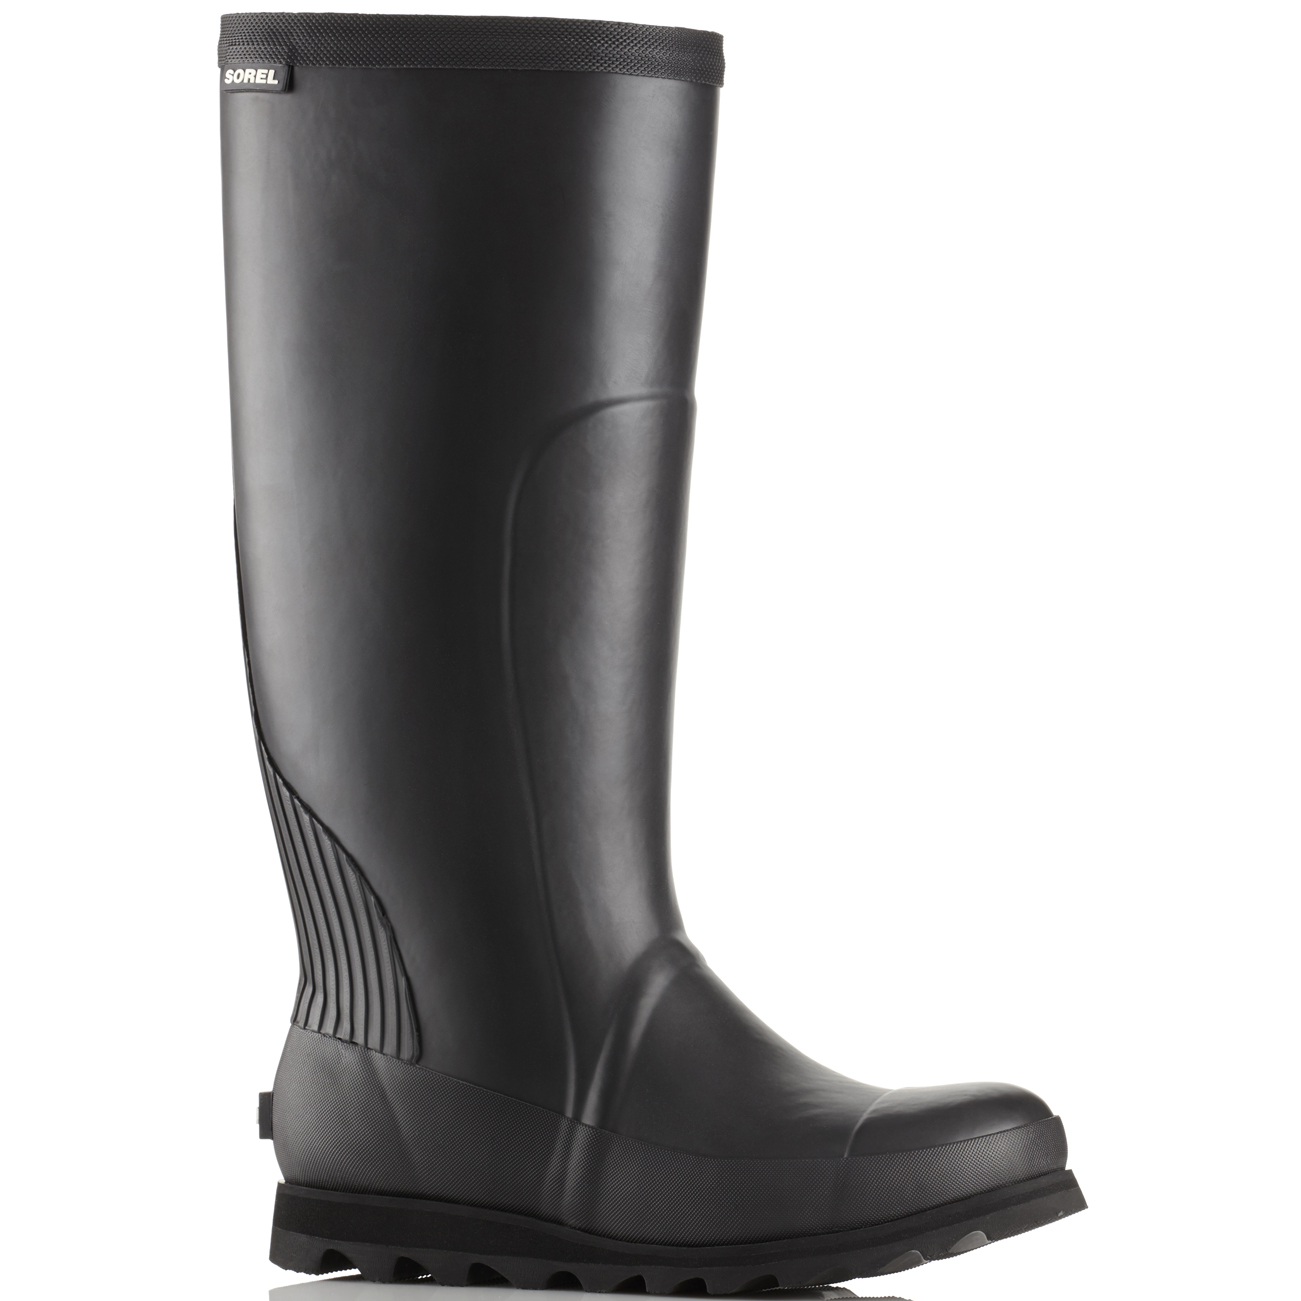 Damen Sorel Joan Regen Tall Wasserdicht Gummi Schnee Regen 36-42 Wellington EU 36-42 Regen d78a2f